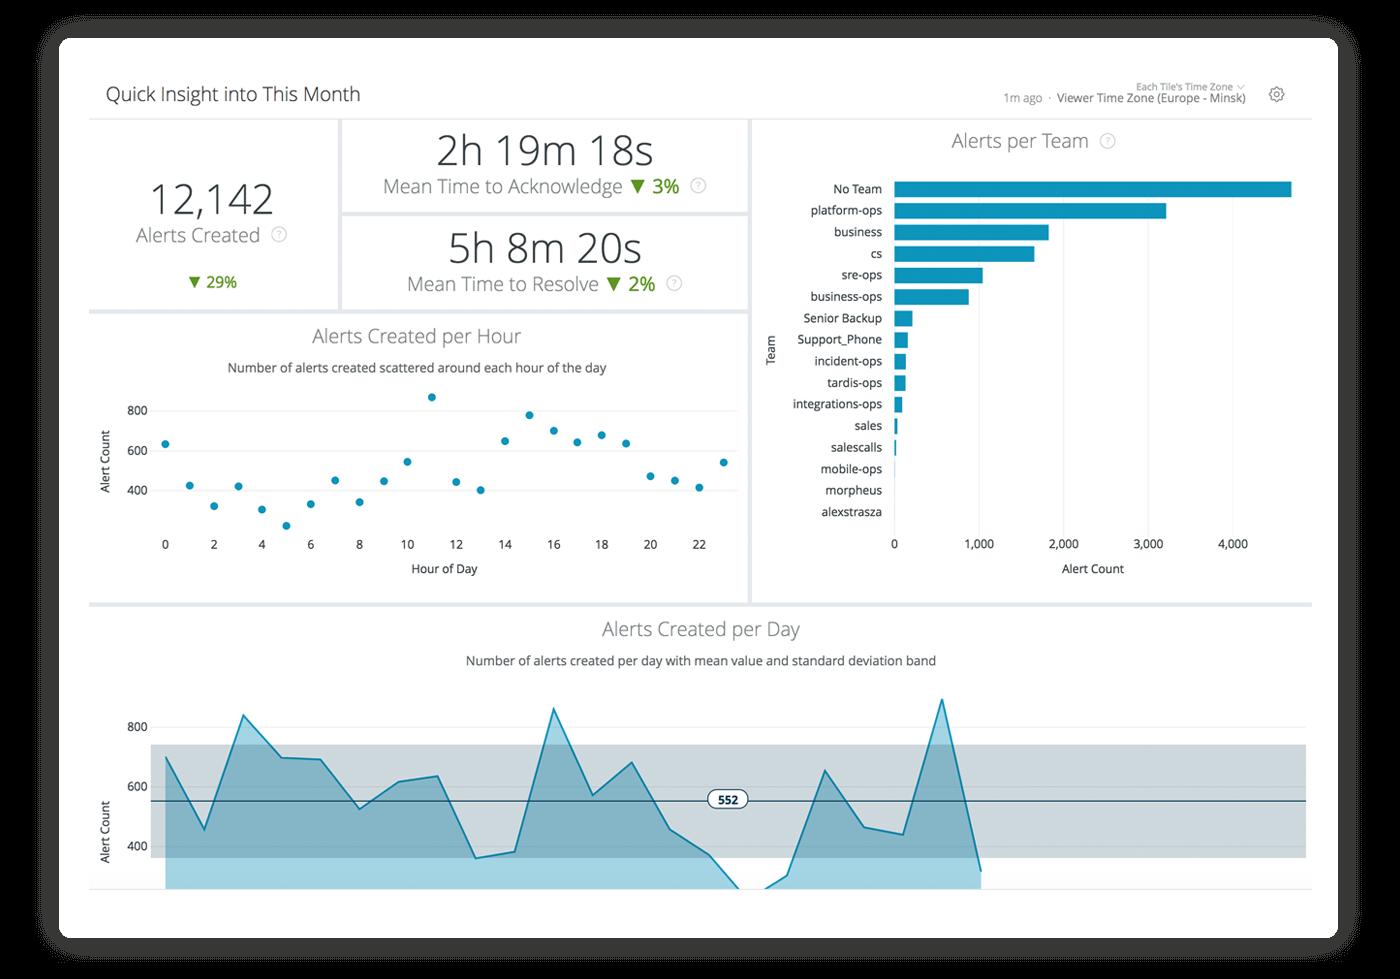 Снимок экрана: обзорная аналитика за месяц